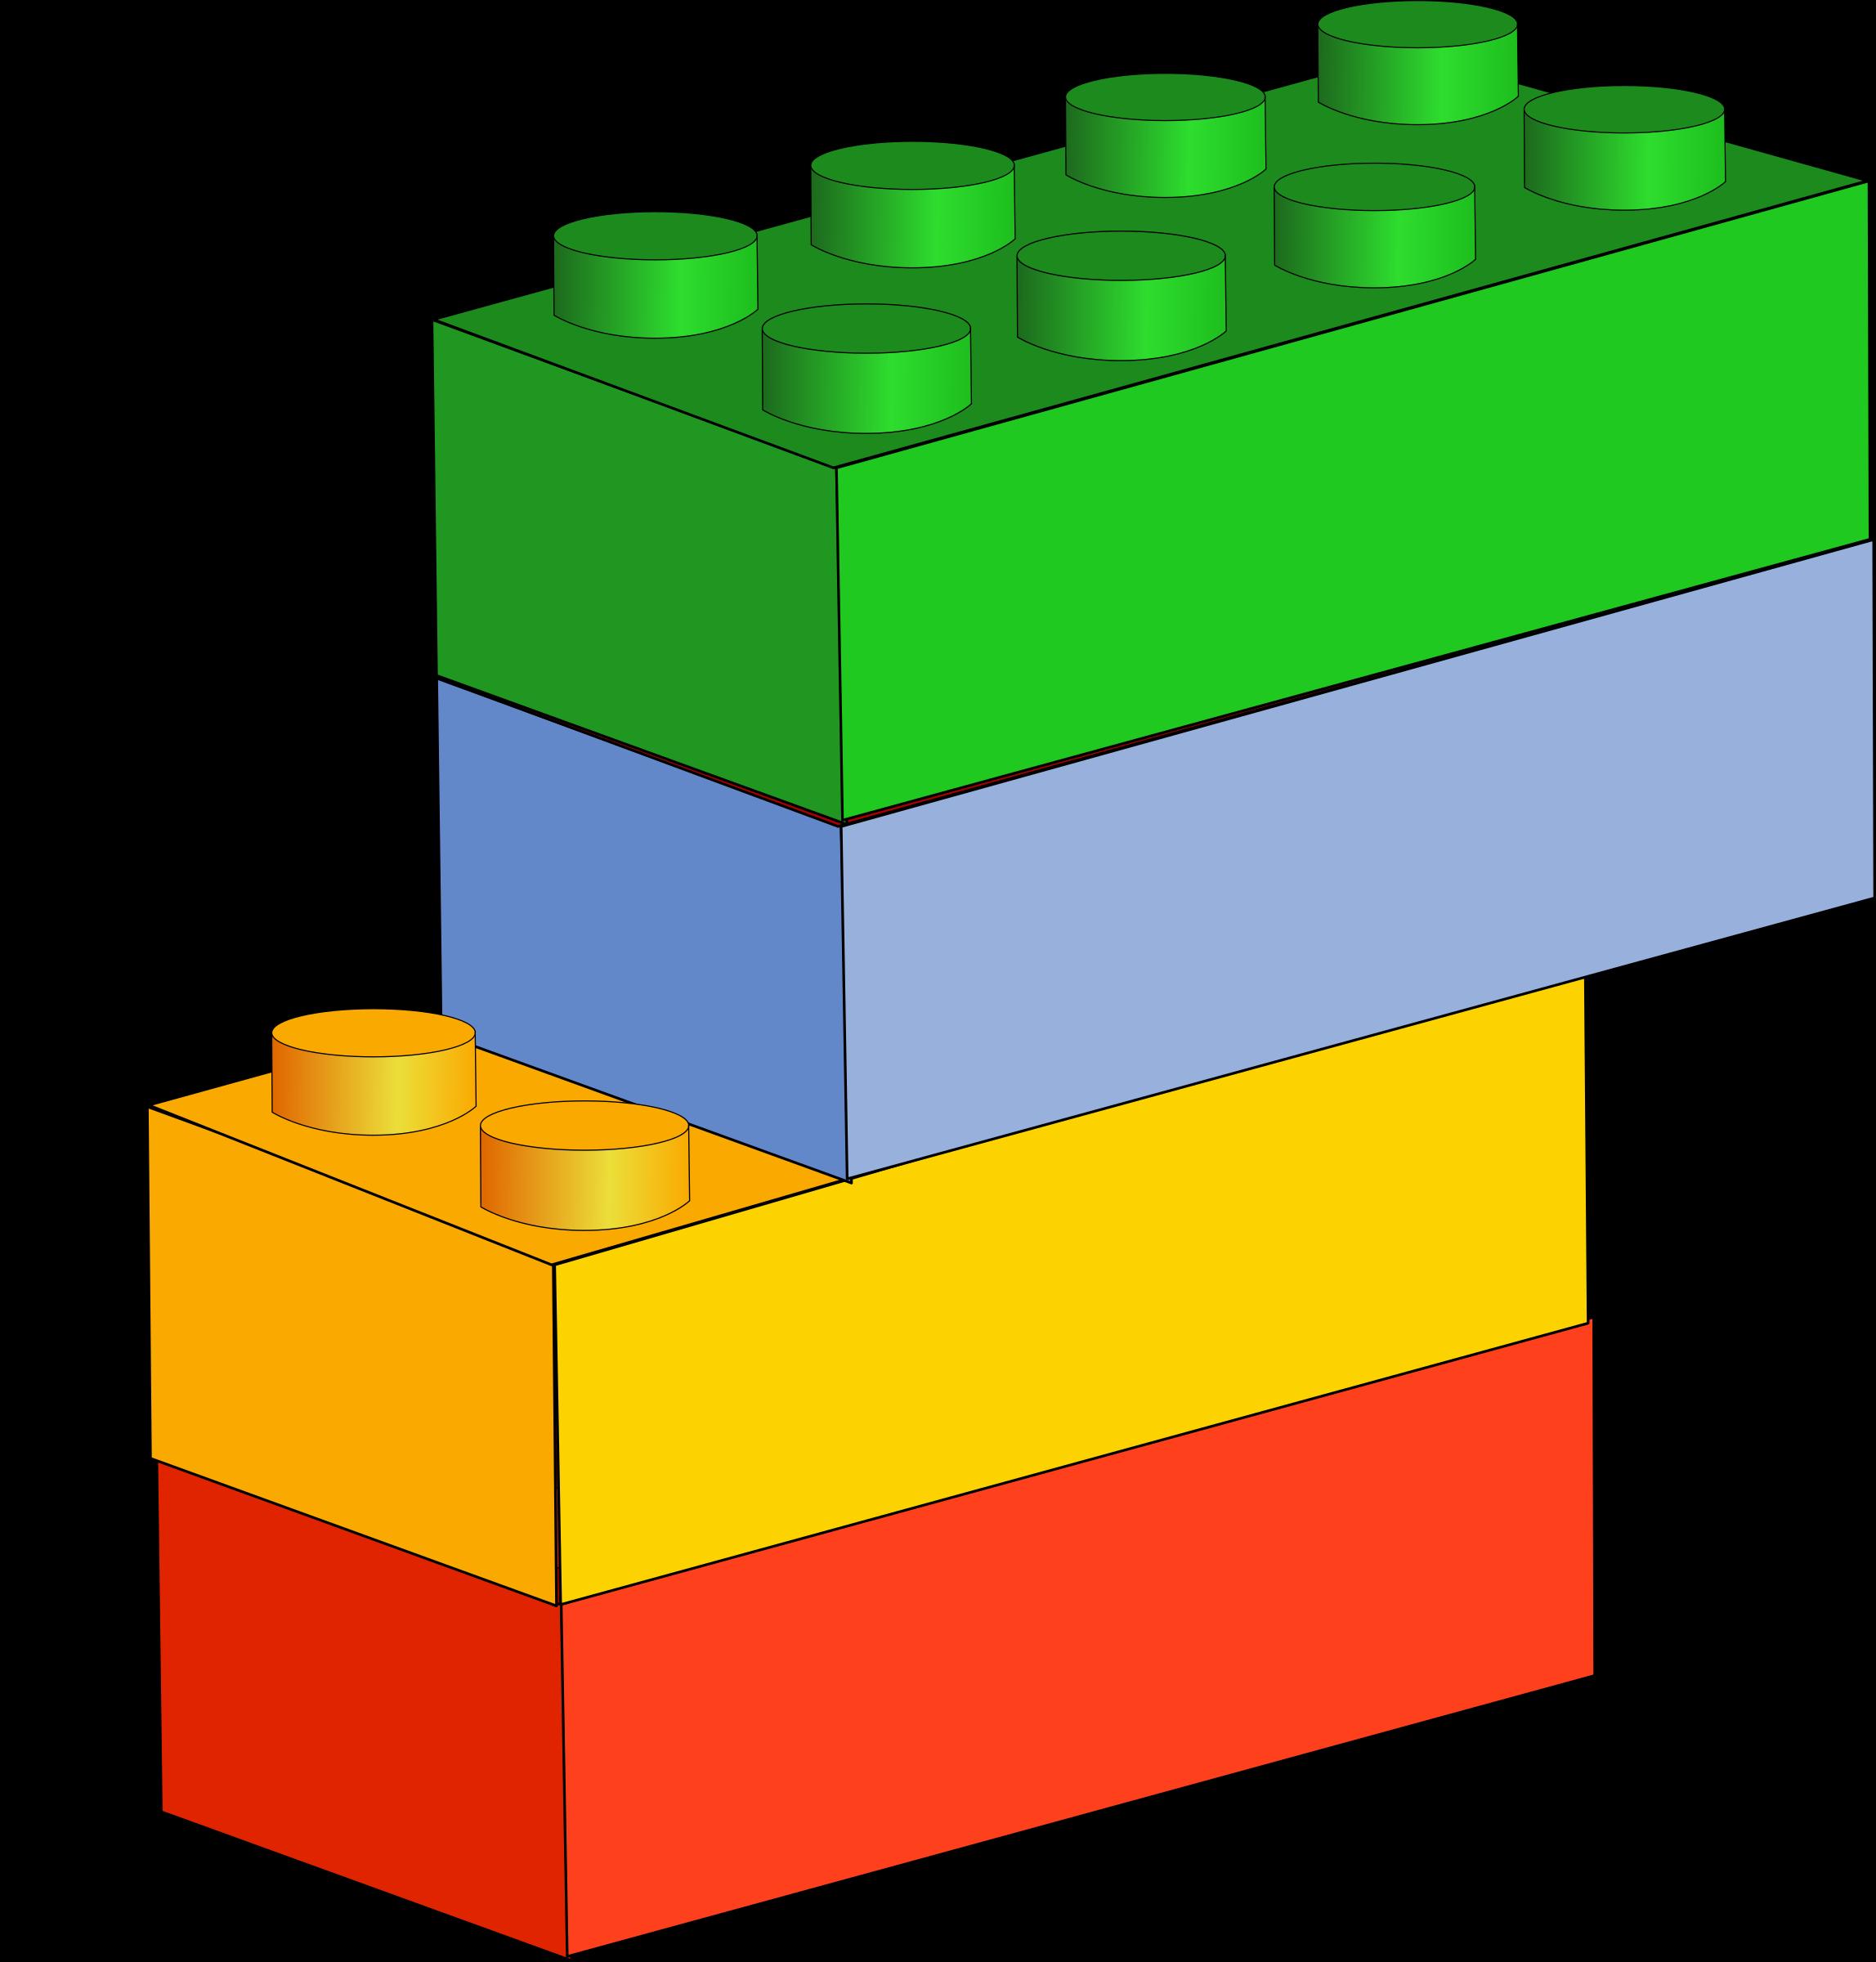 Clipart - Bricks 2